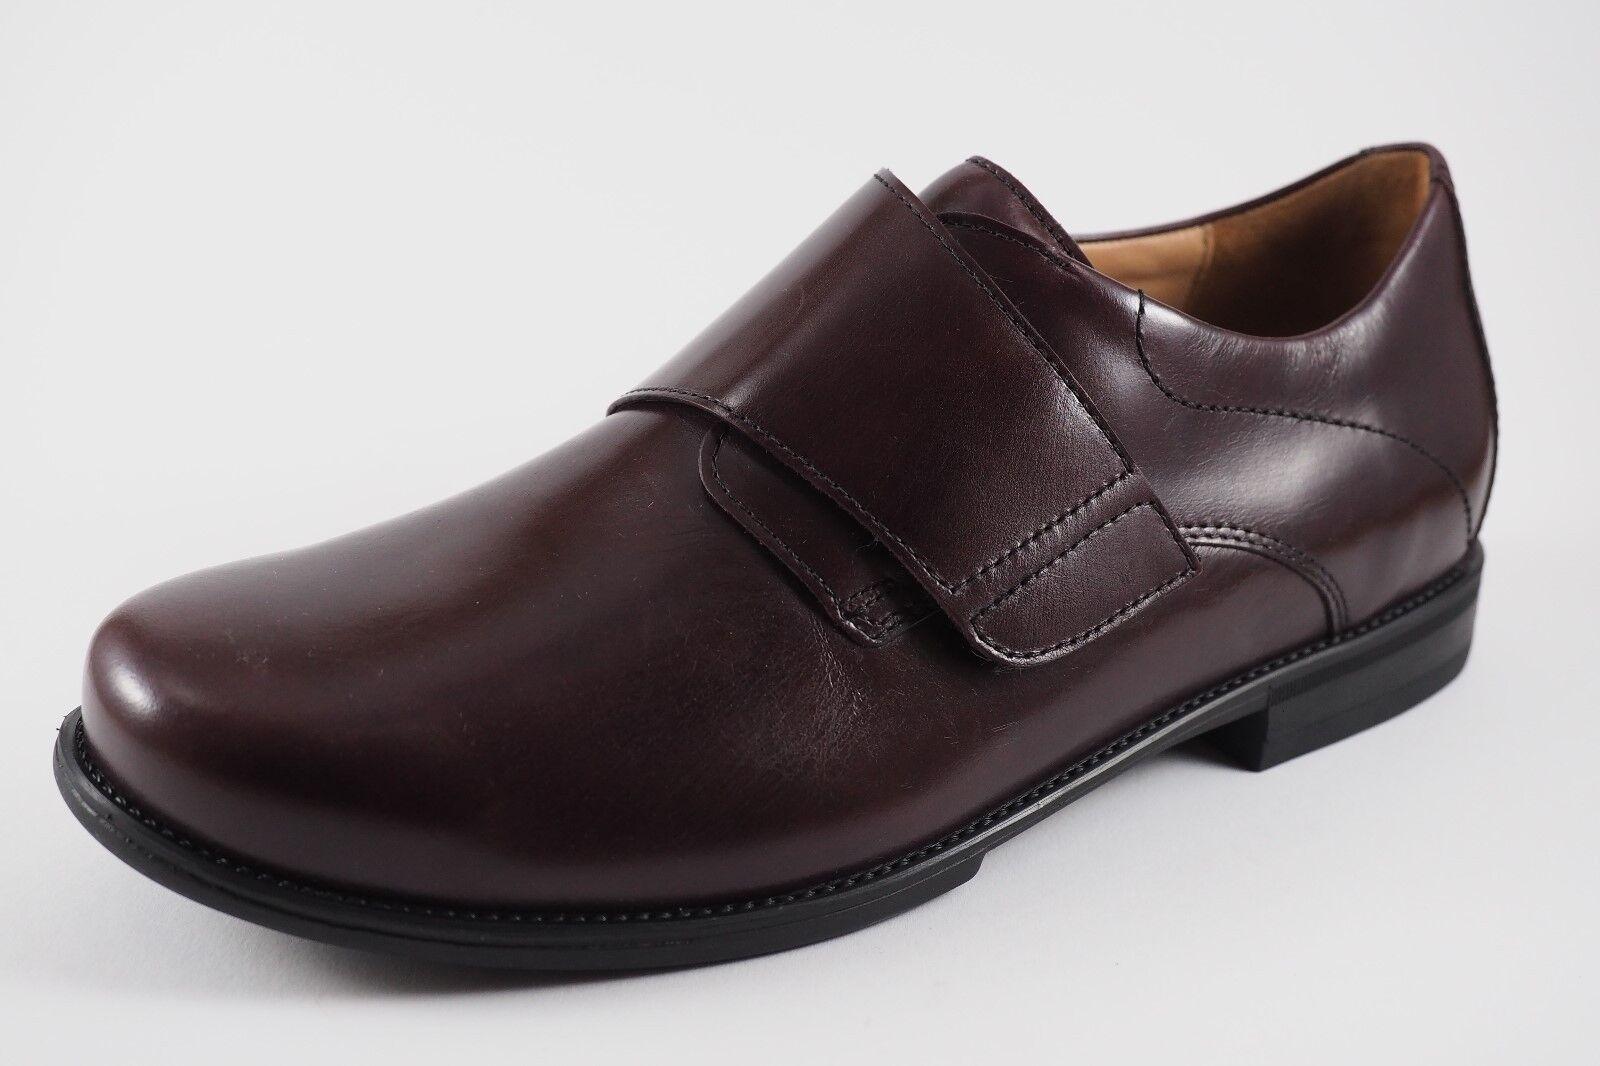 Ganter Ganter Ganter Uomo Pantofola 7,5 G 41 1/2 Scarpe Basse pelle Bordo per Inserto Nuovo 5c372e